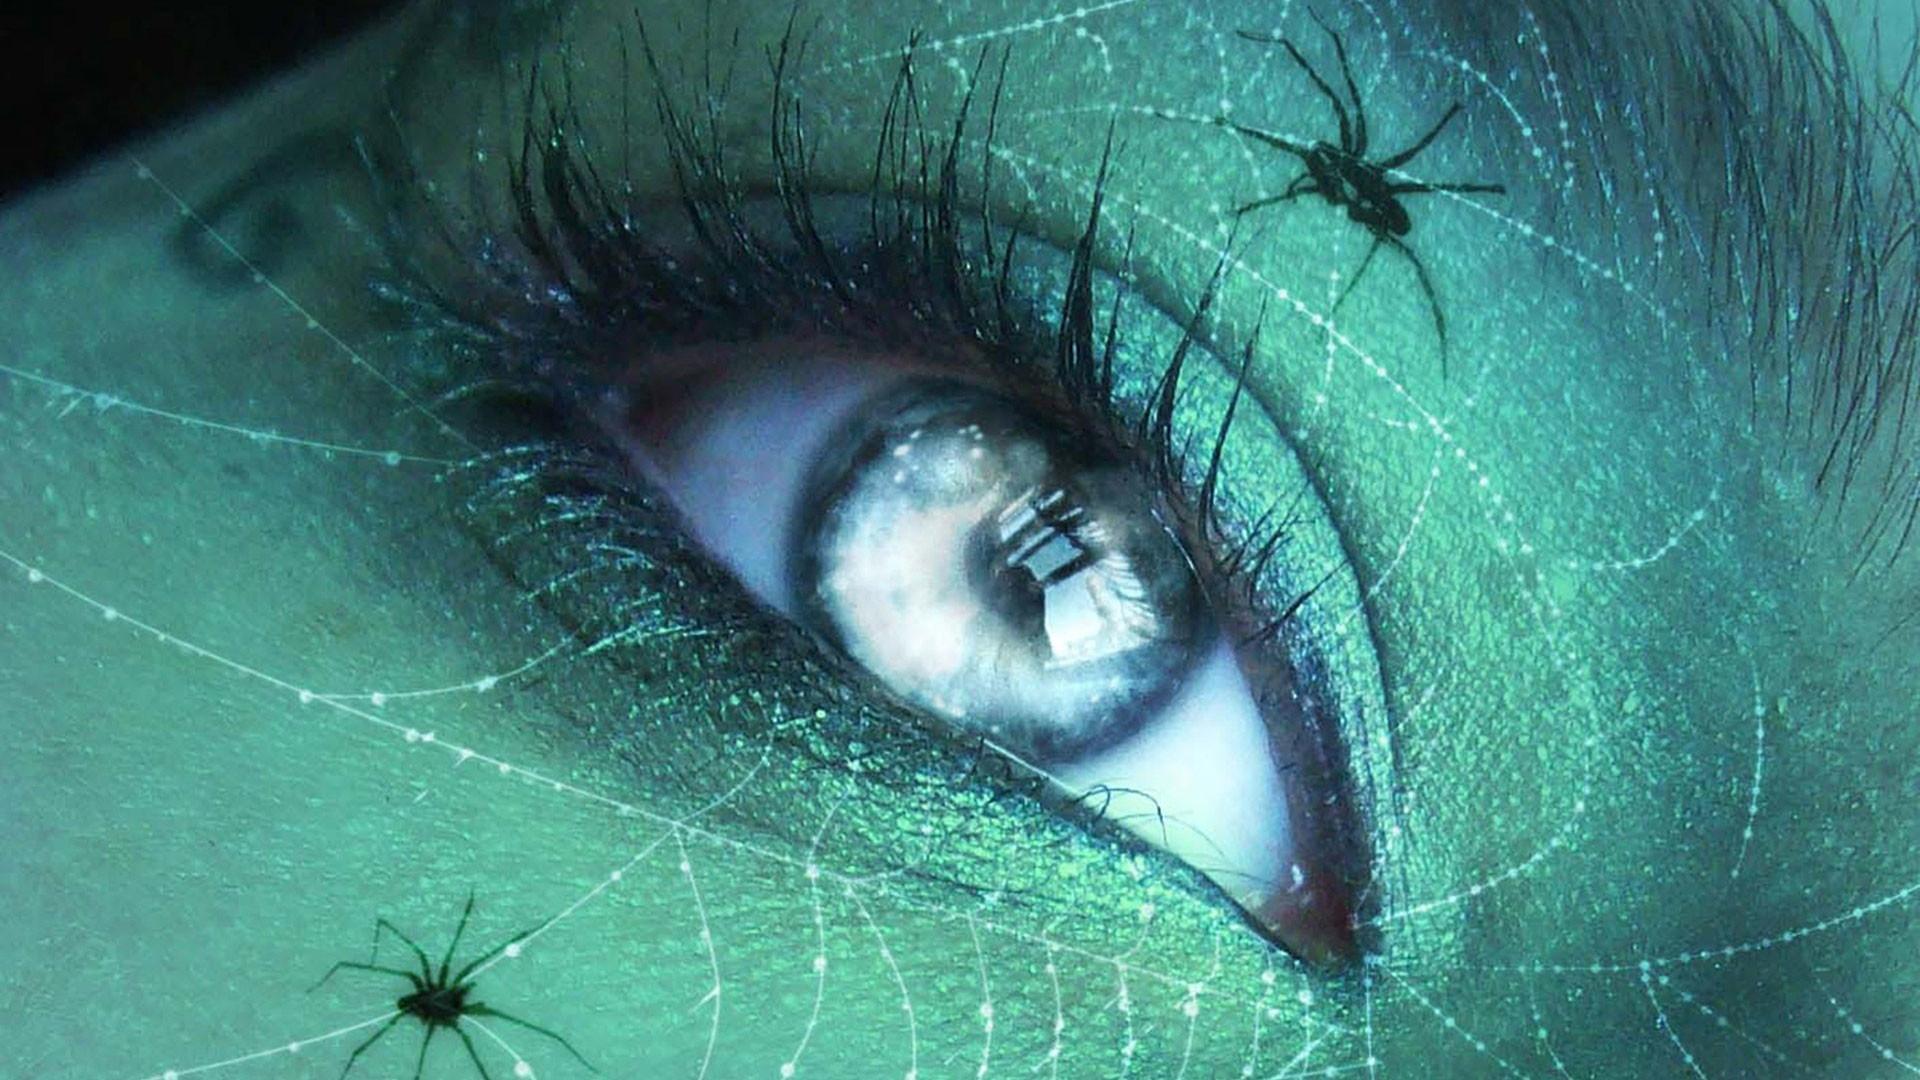 hd pics photos beautiful cute eye close up spider web macro hd quality  desktop background wallpaper